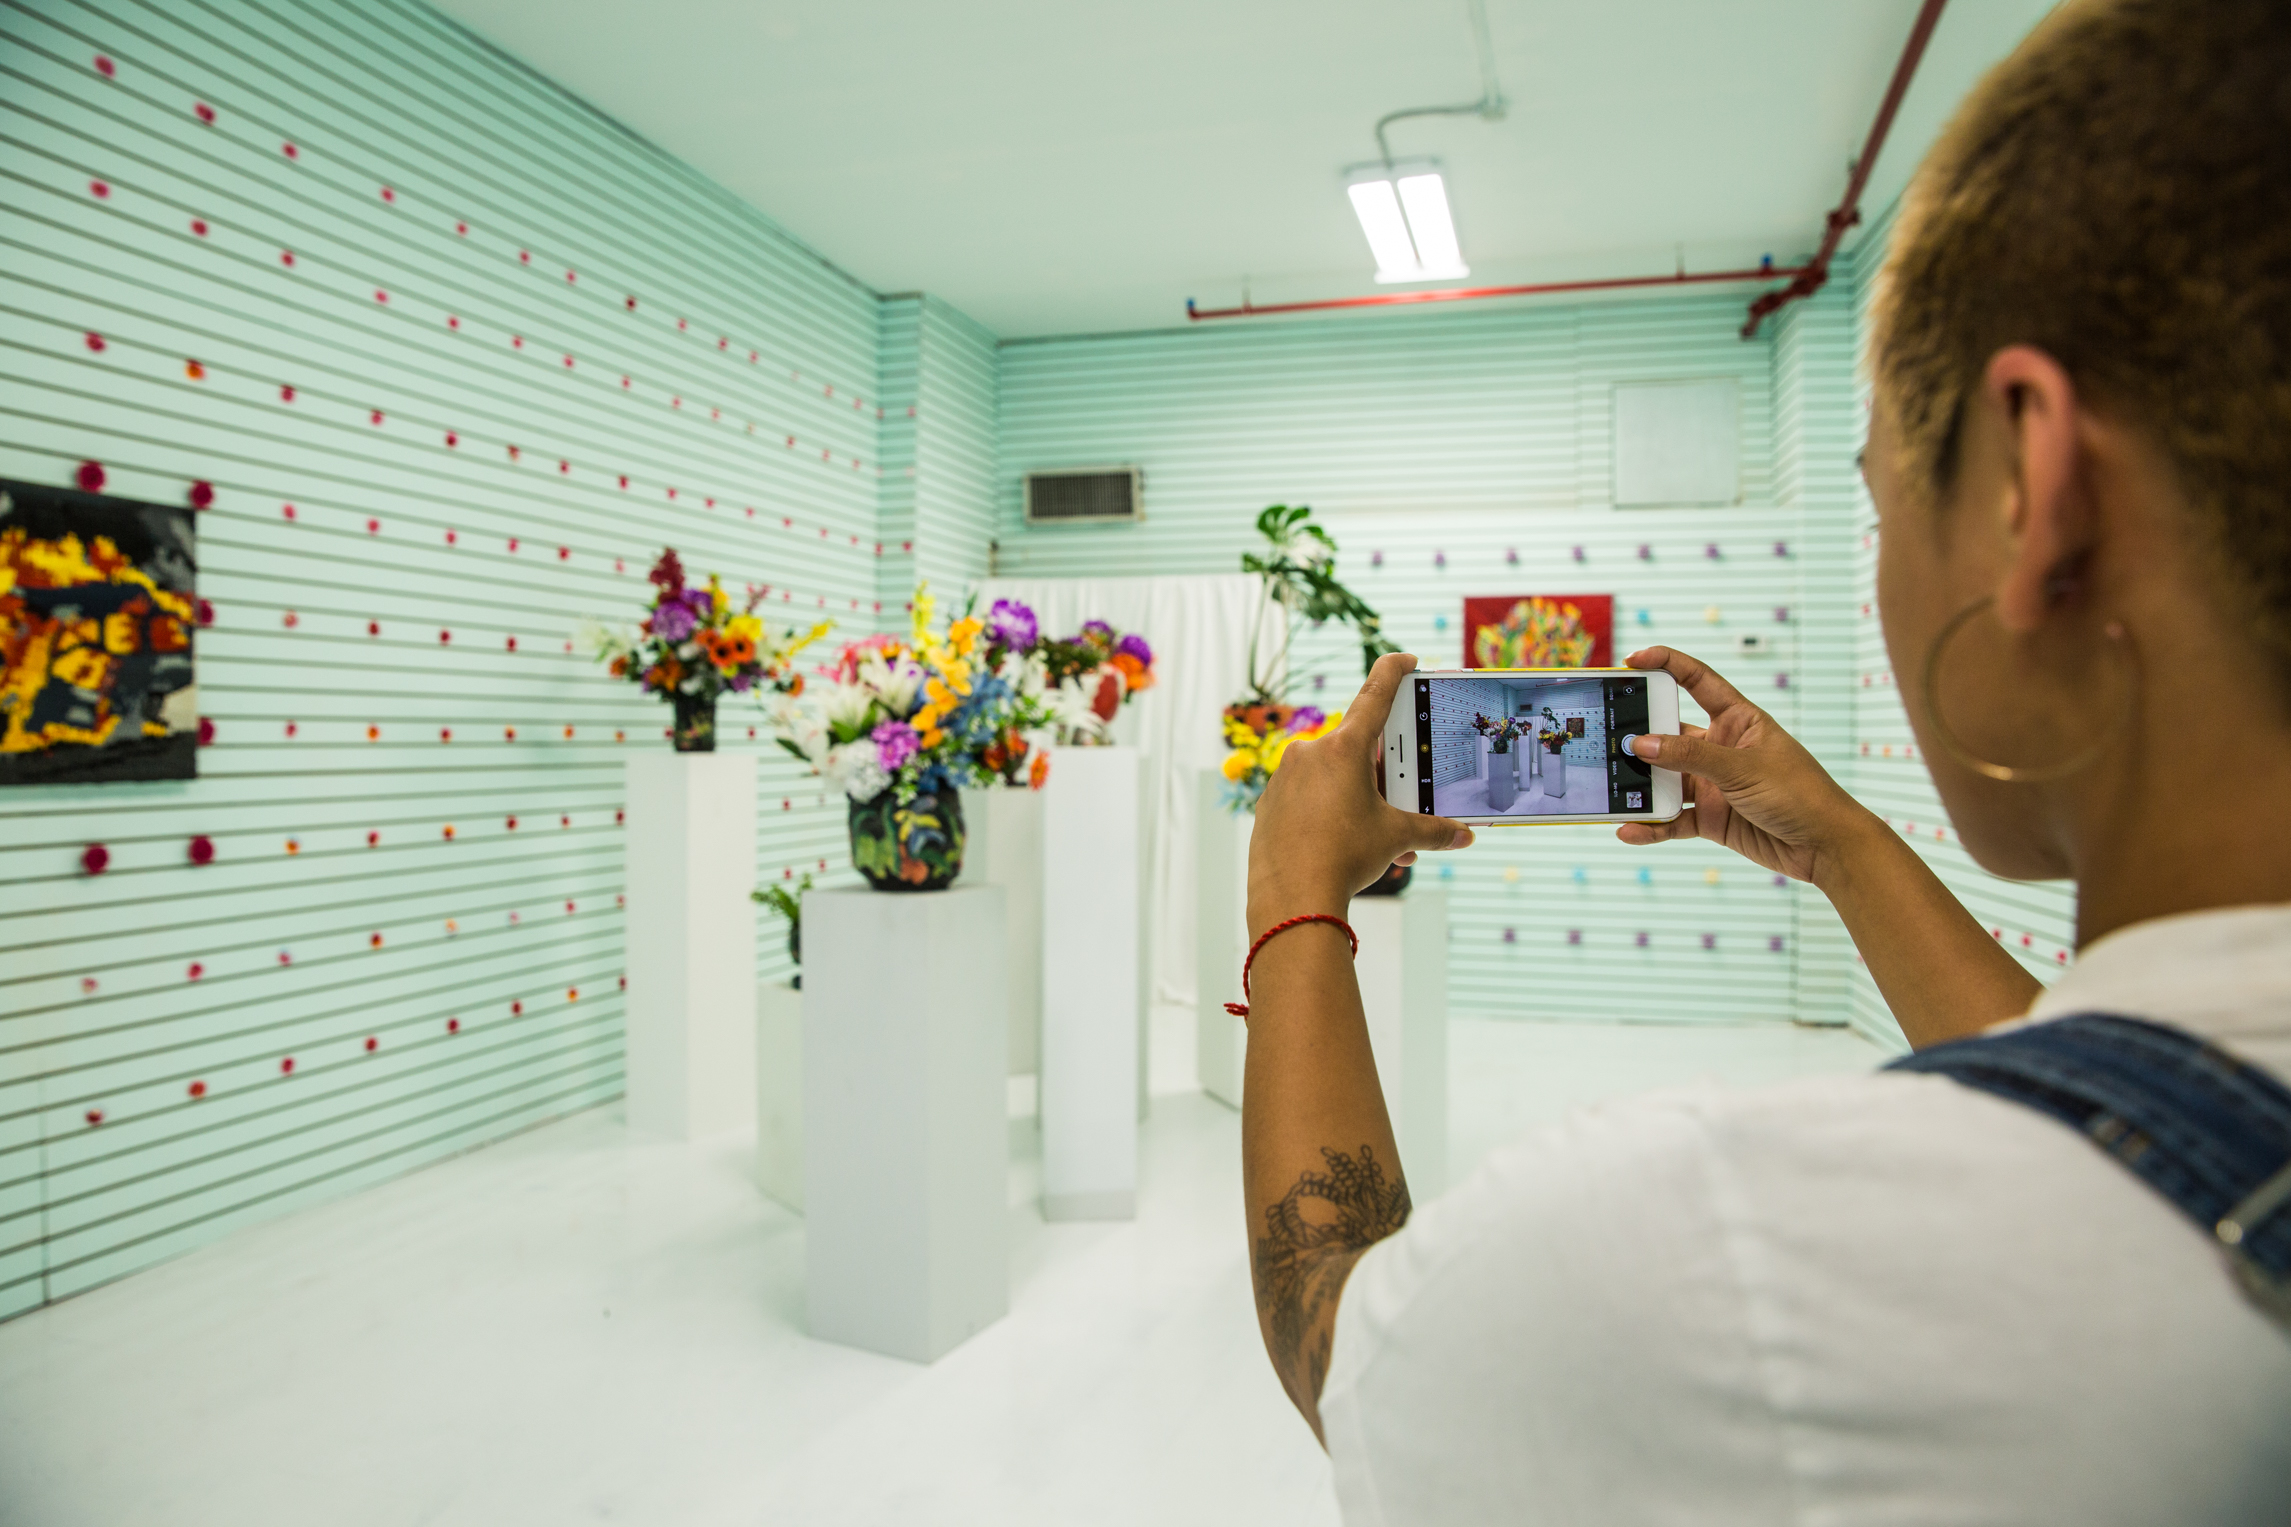 carolinelarsen-flowershop-theholeoncanal-072818-03.jpg